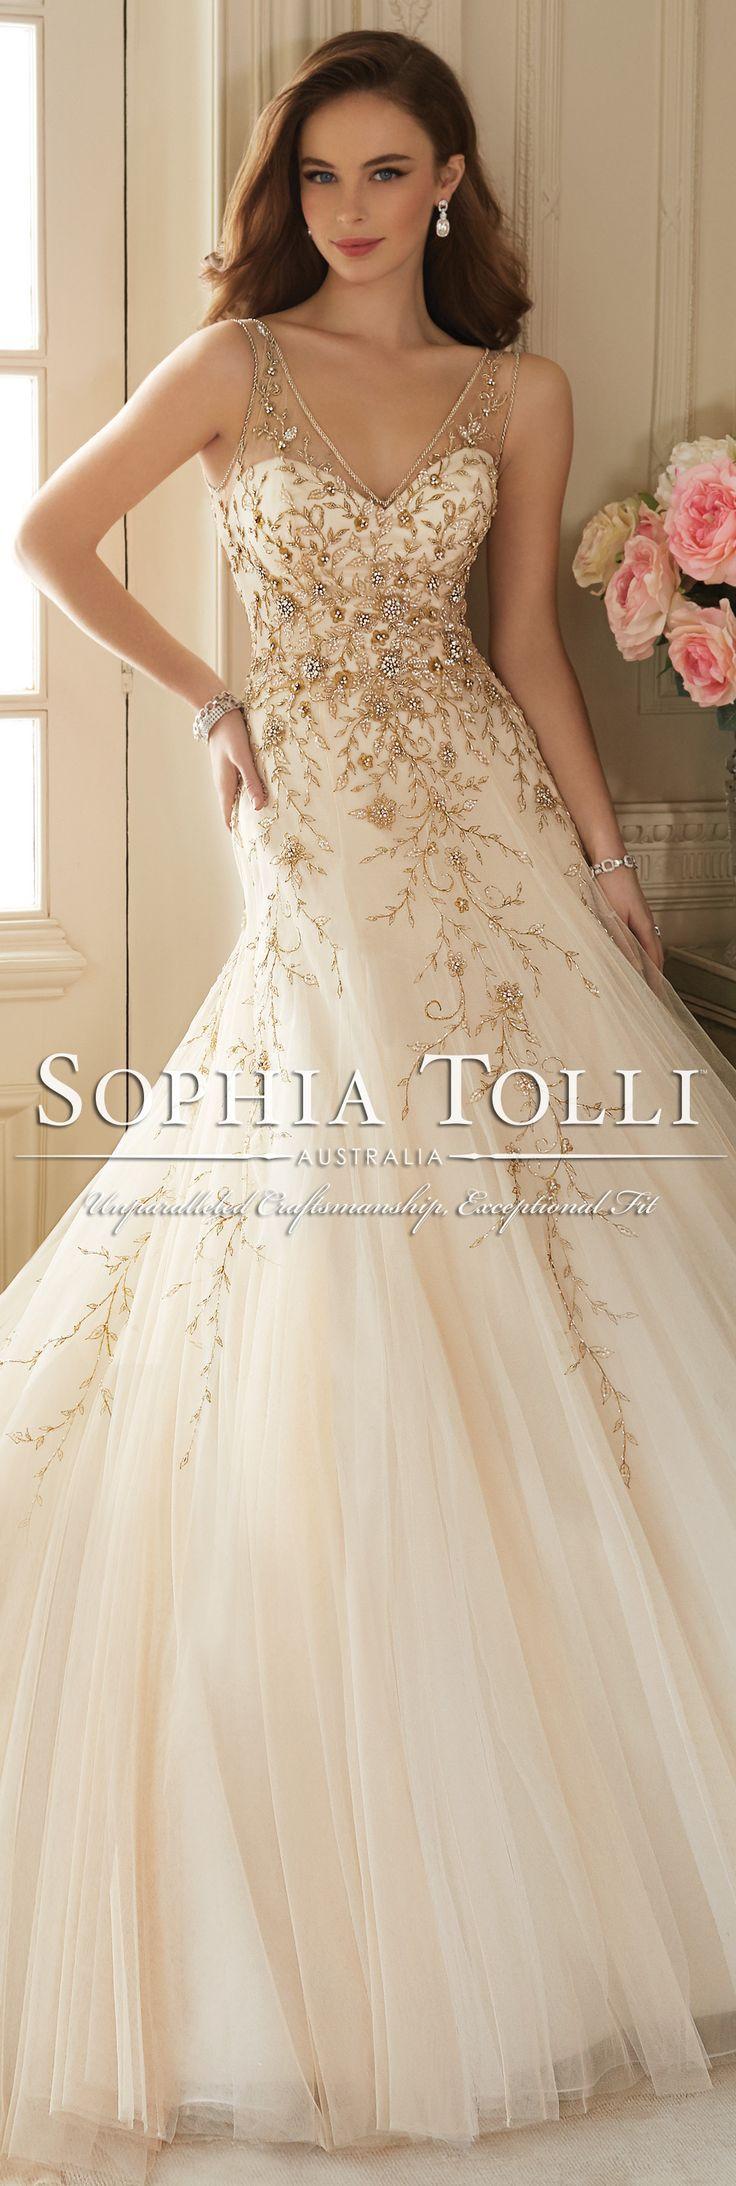 The Sophia Tolli Spring 2016 Wedding Dress Collection - Style No. Y11650 - Darice #tulleweddingdress